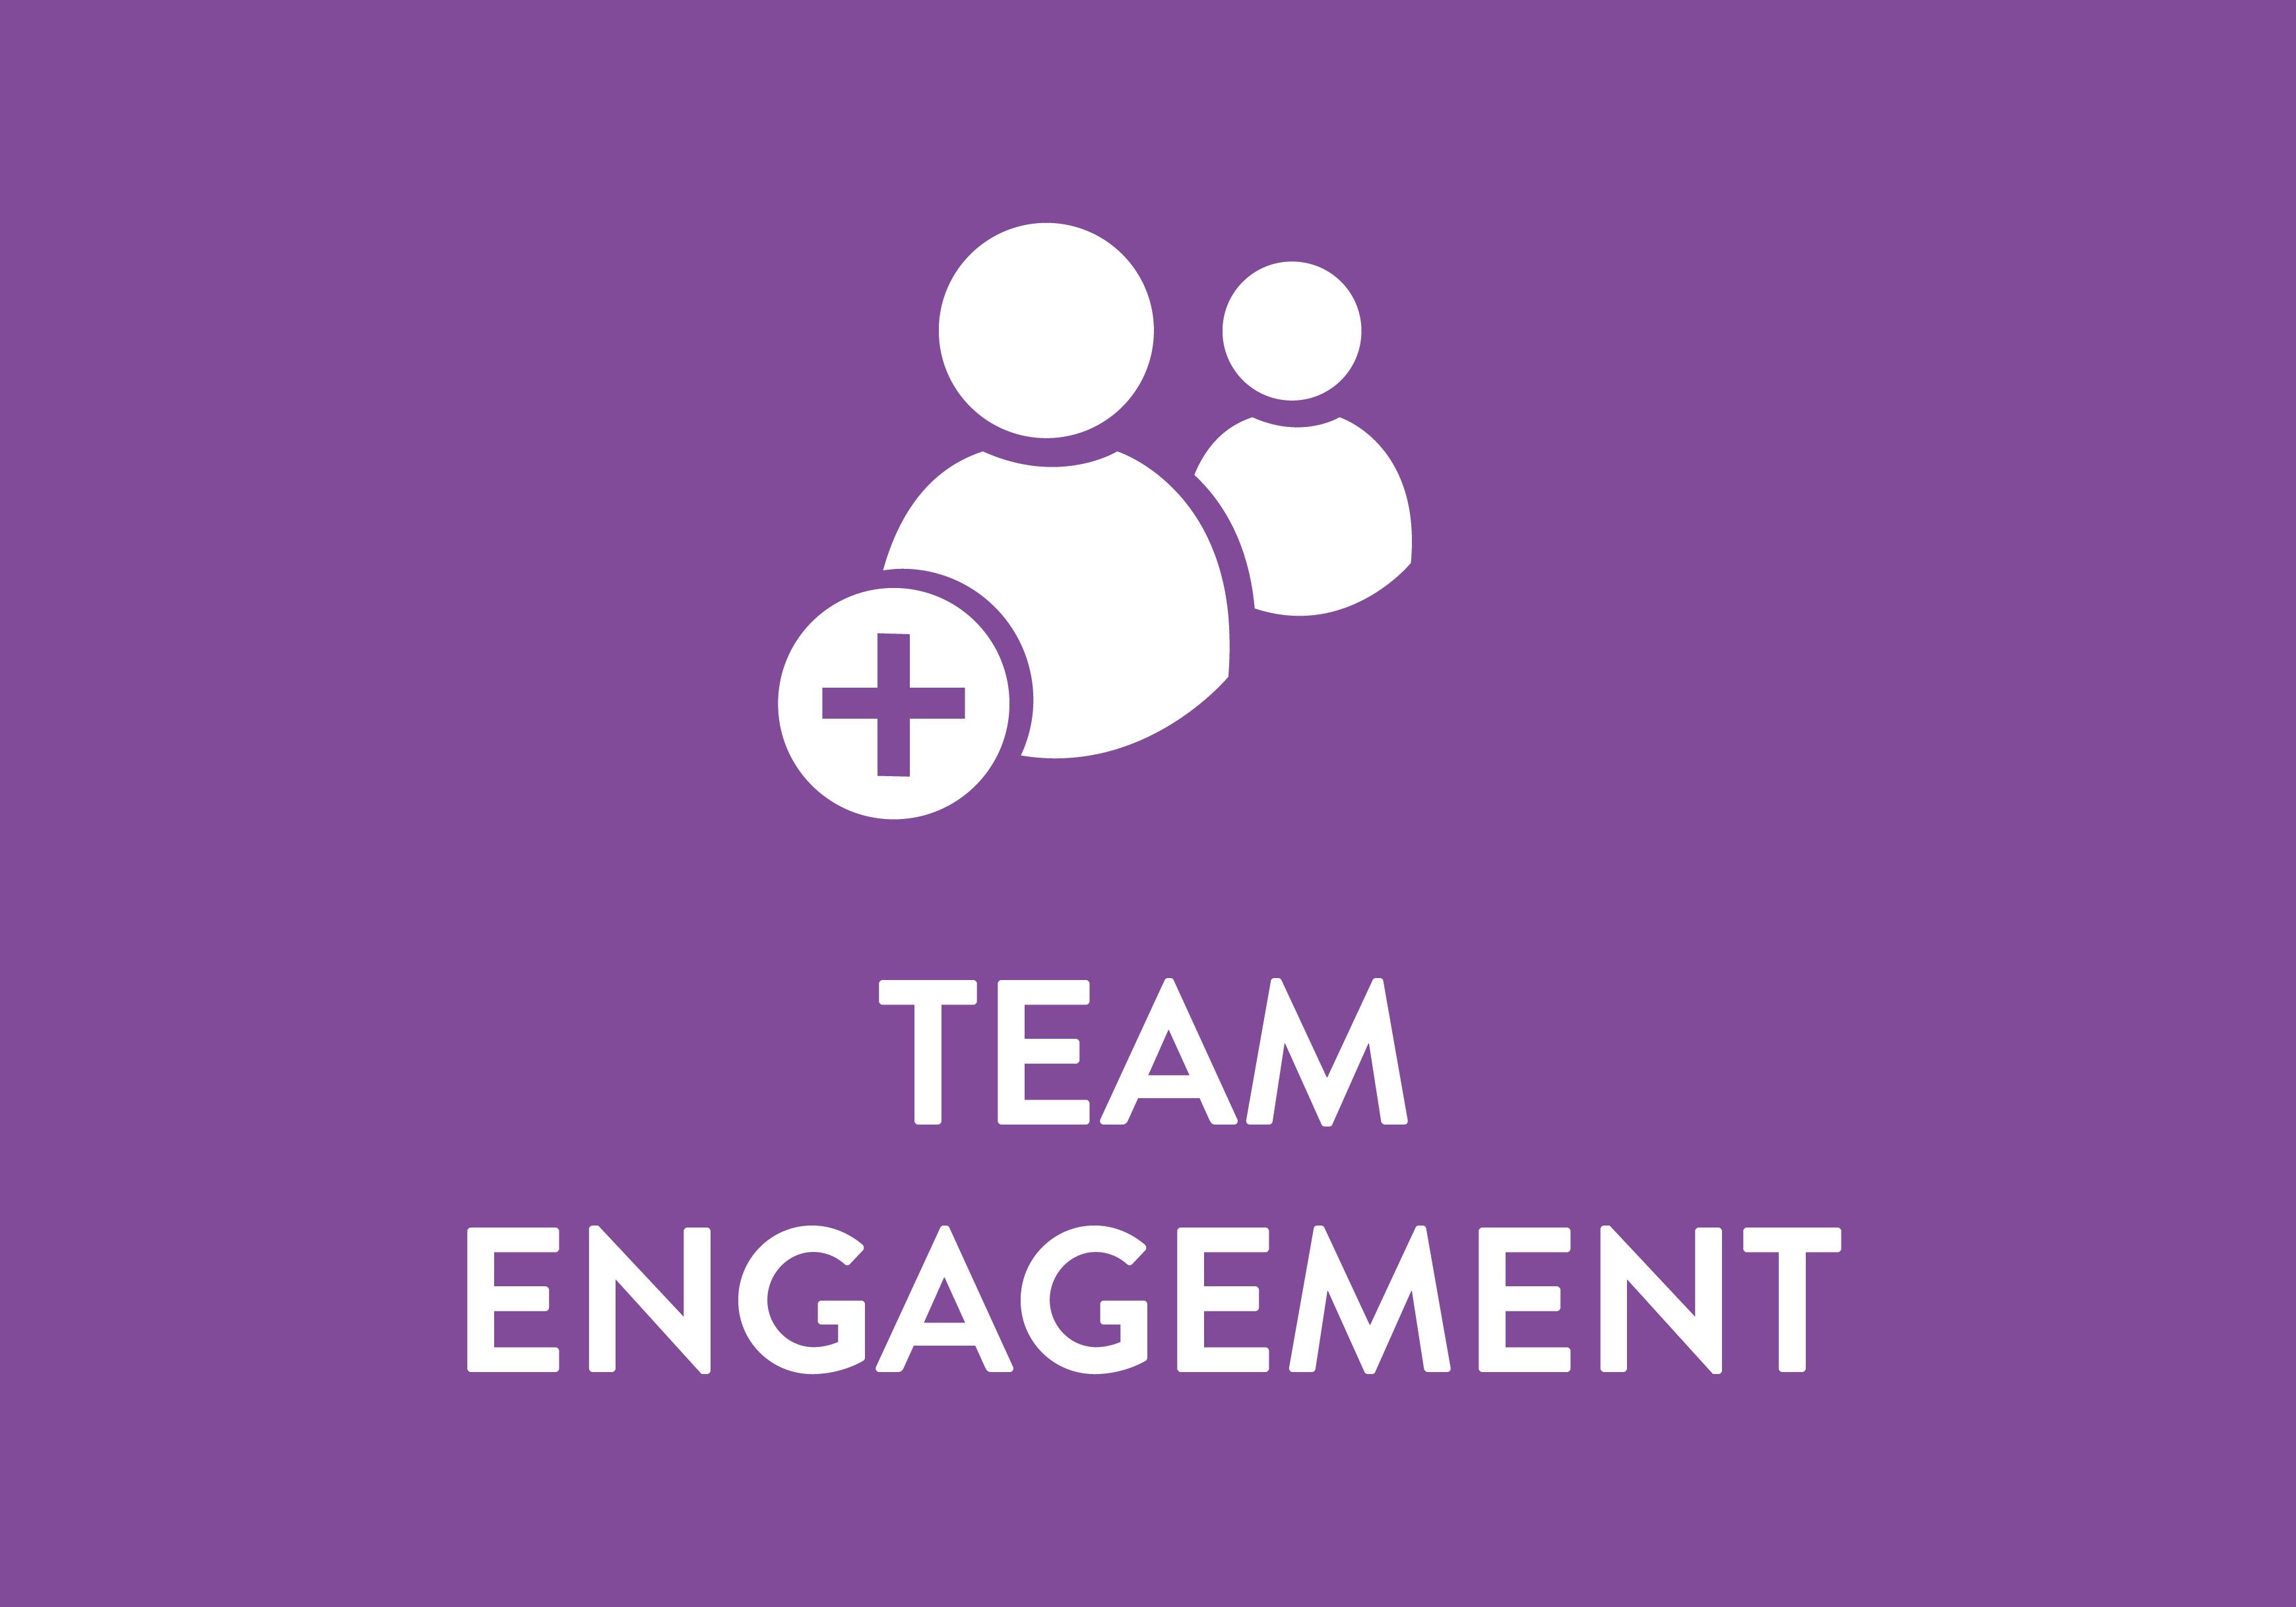 Team-Engagement-16